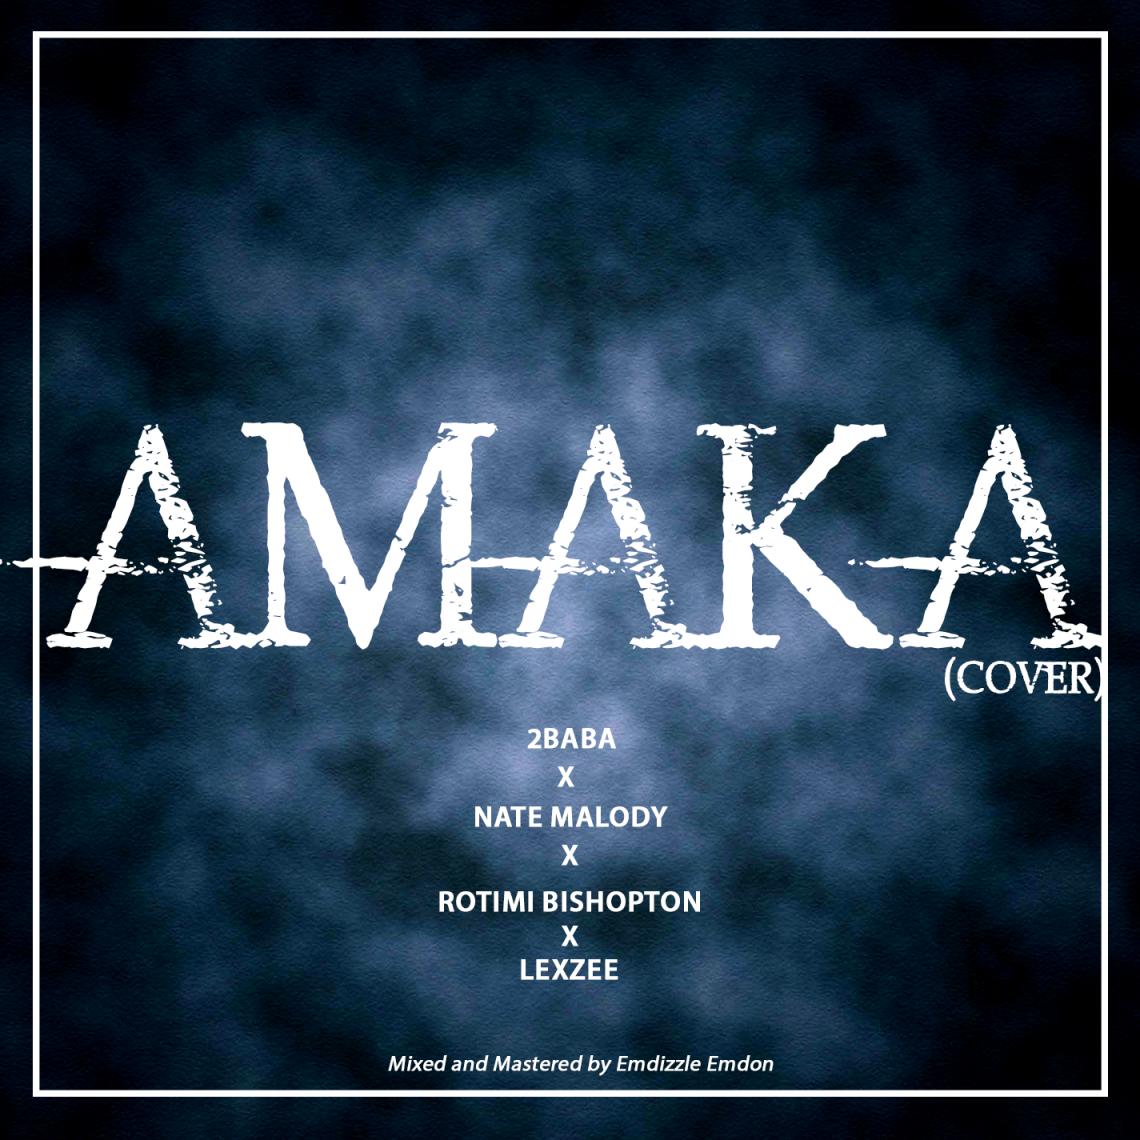 Amaka  Cover – 2baba ft Nate Malody, Rotimi Bishopton and Lexzee